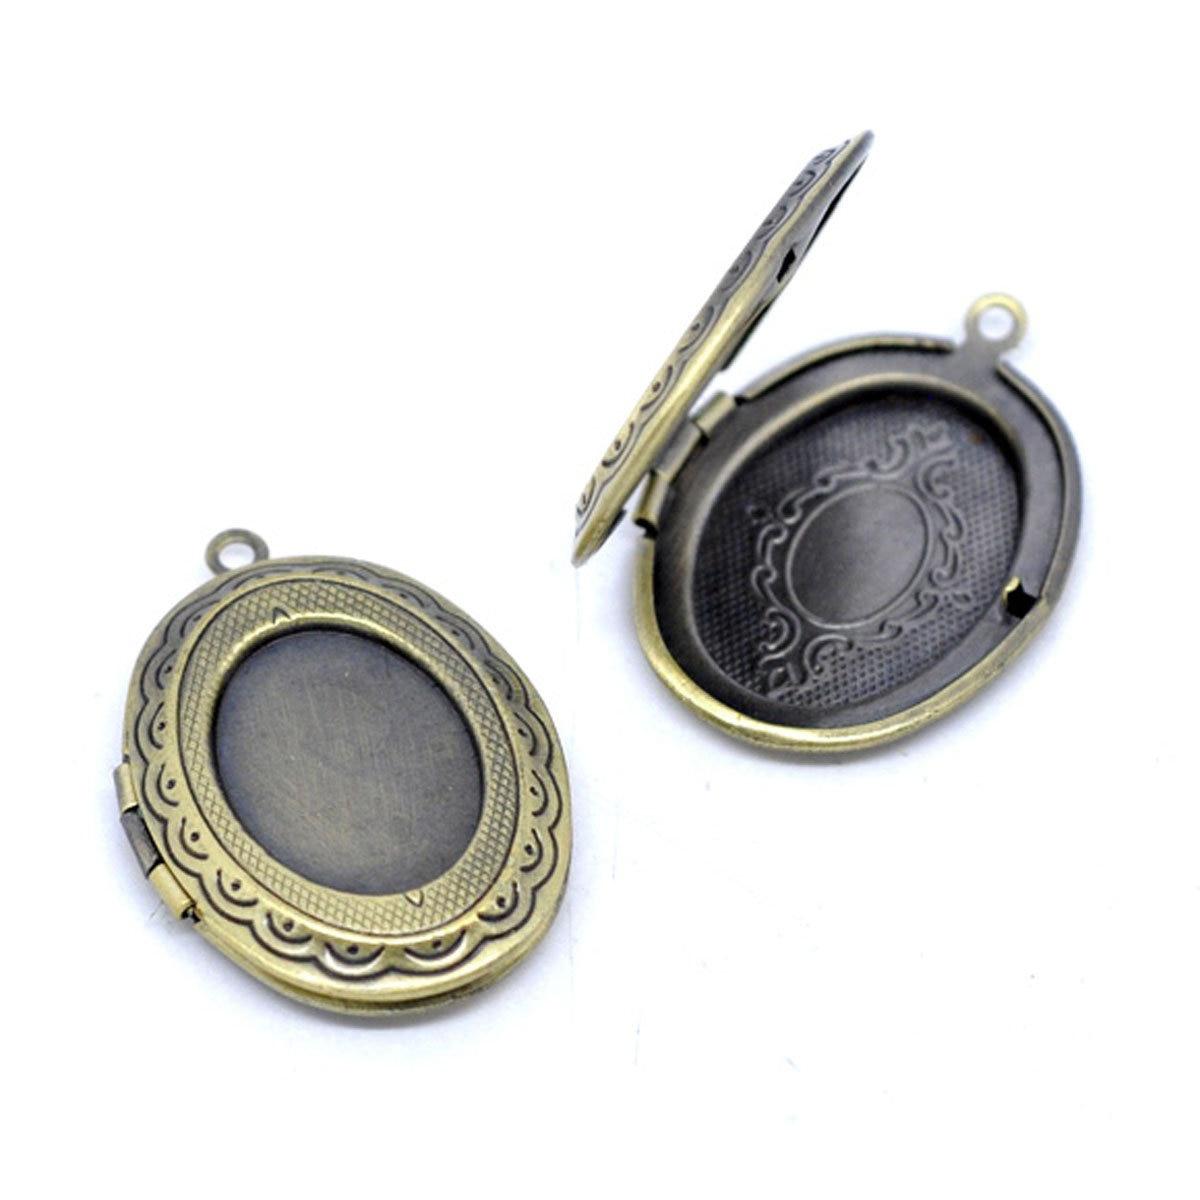 CNIM Hot 5 Medallion Oval Pendants 34x24mm Bronze Color Photo Holder